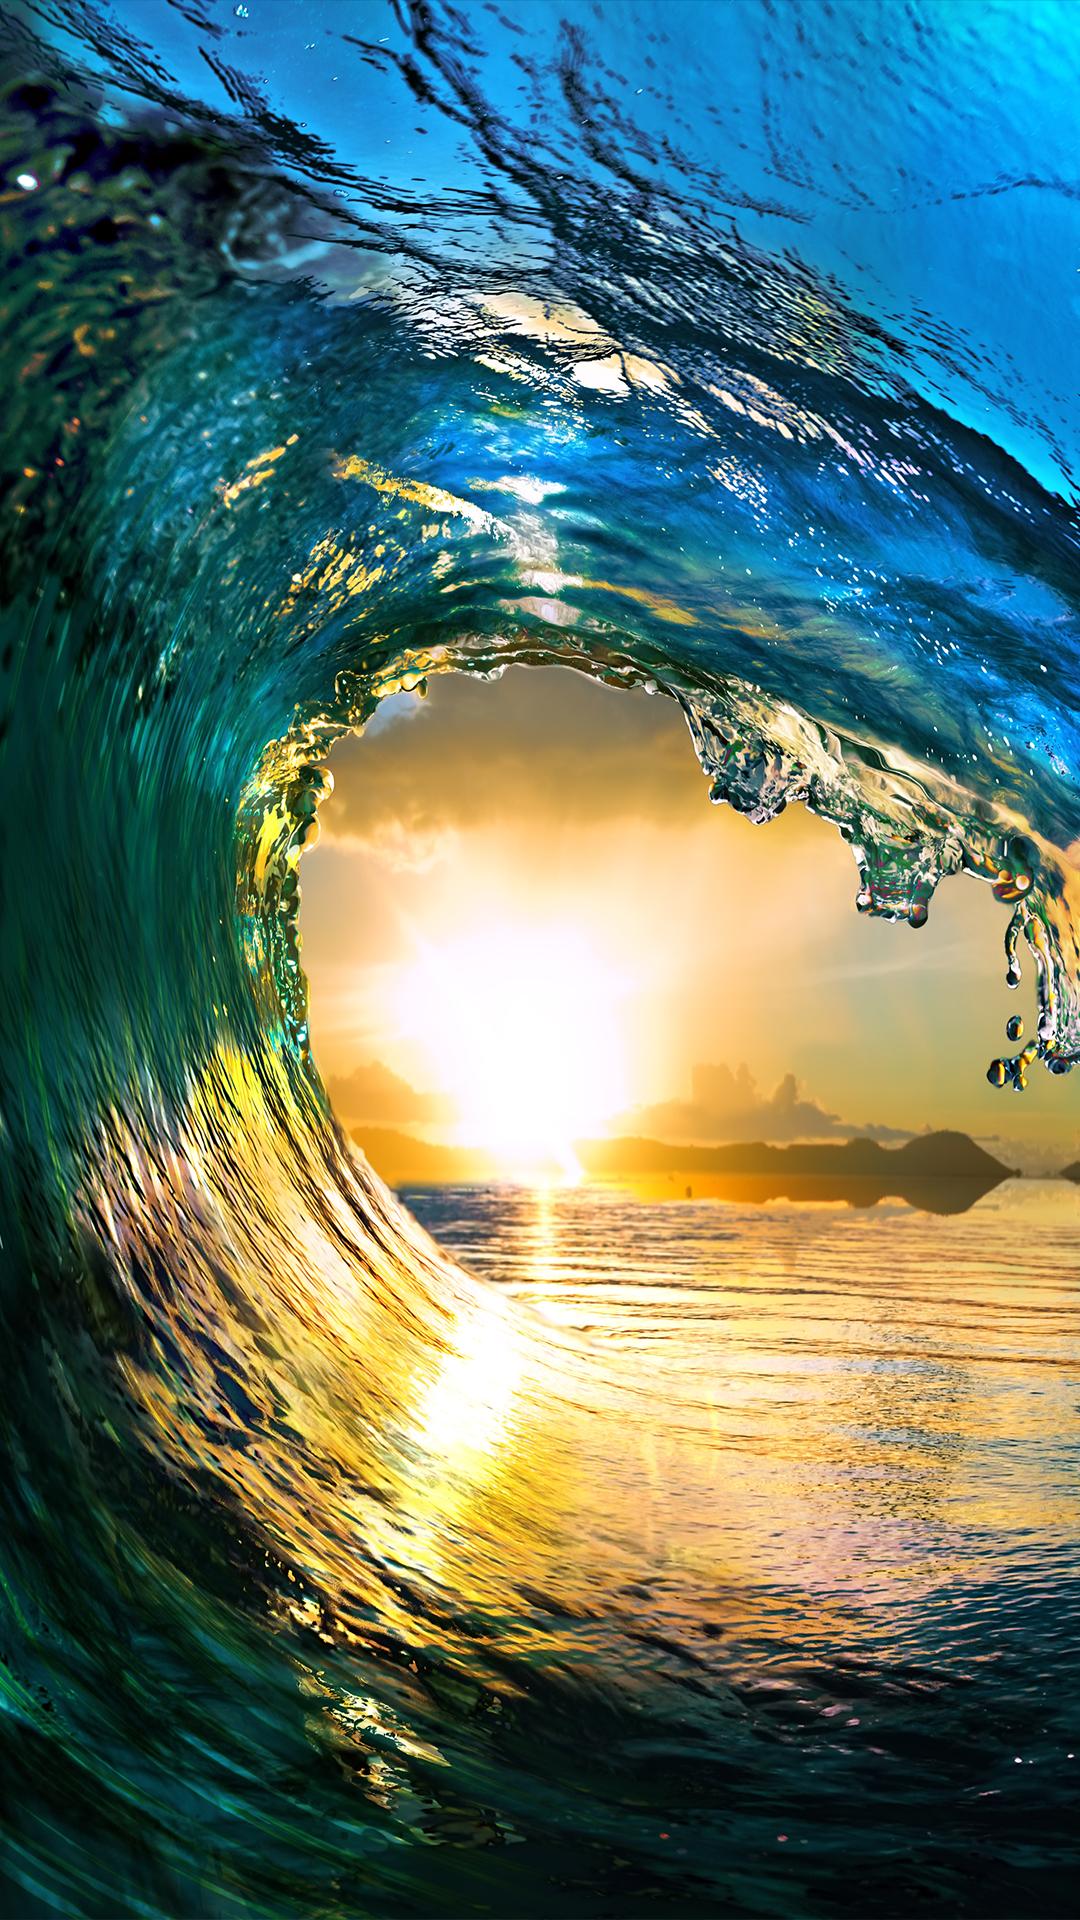 Wallpaper iphone art hd - Art Creative Water Sea Waves Sun Sky Iphone 6 Wallpaperwallpaper Backgroundsphone Backgroundssummer Wallpaperhd